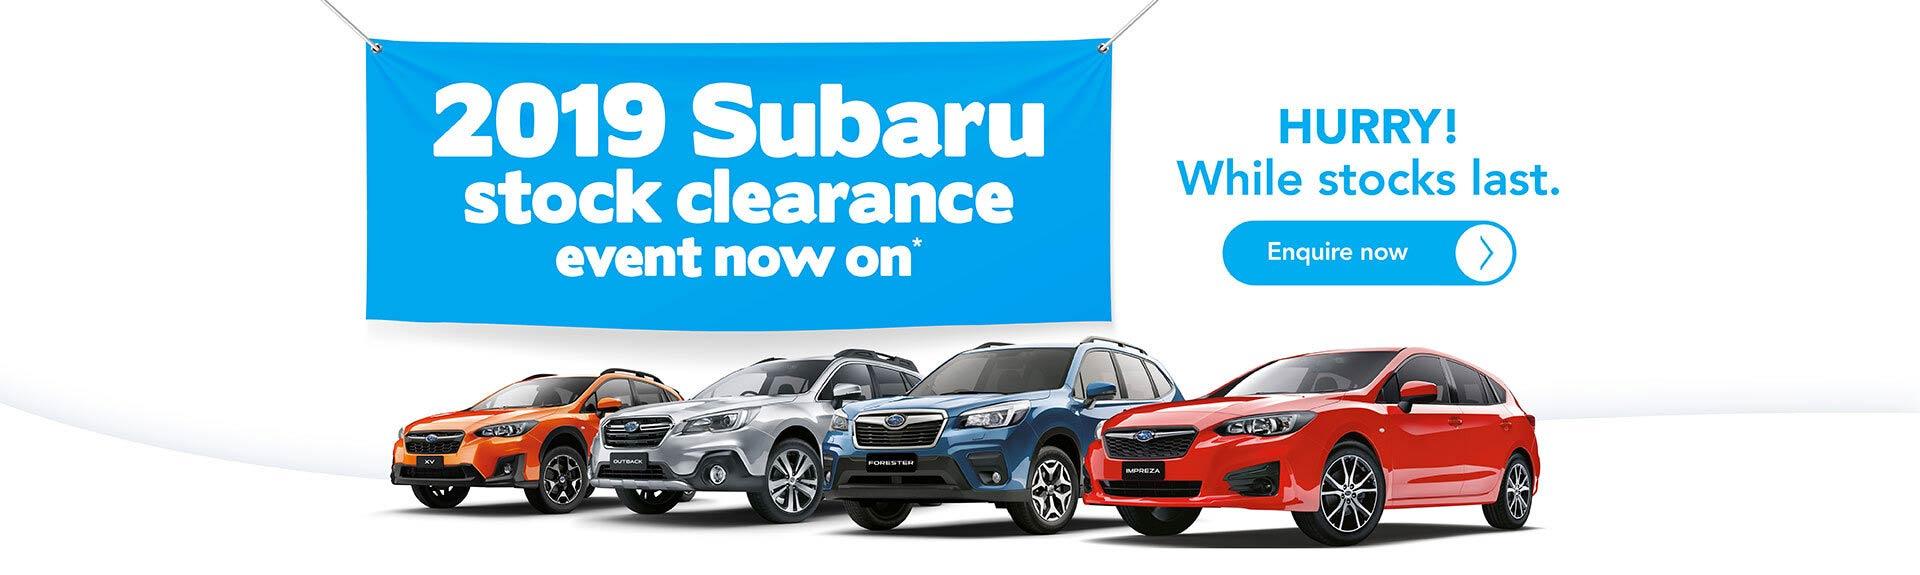 Subaru 2019 Plate Clearance